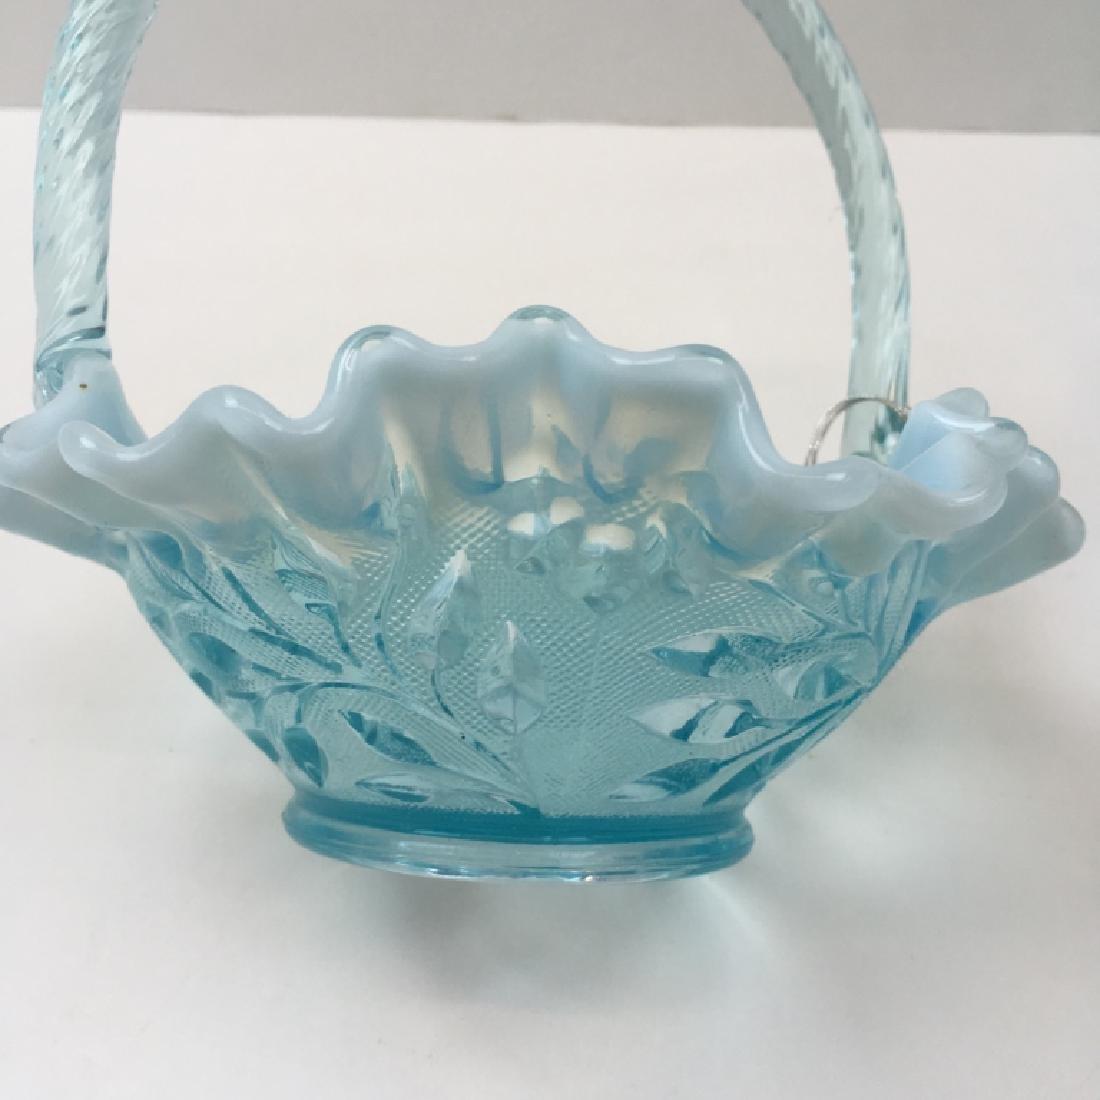 5 PCS OF VINTAGE BLUE OPALESCENT & SATIN GLASS - 16